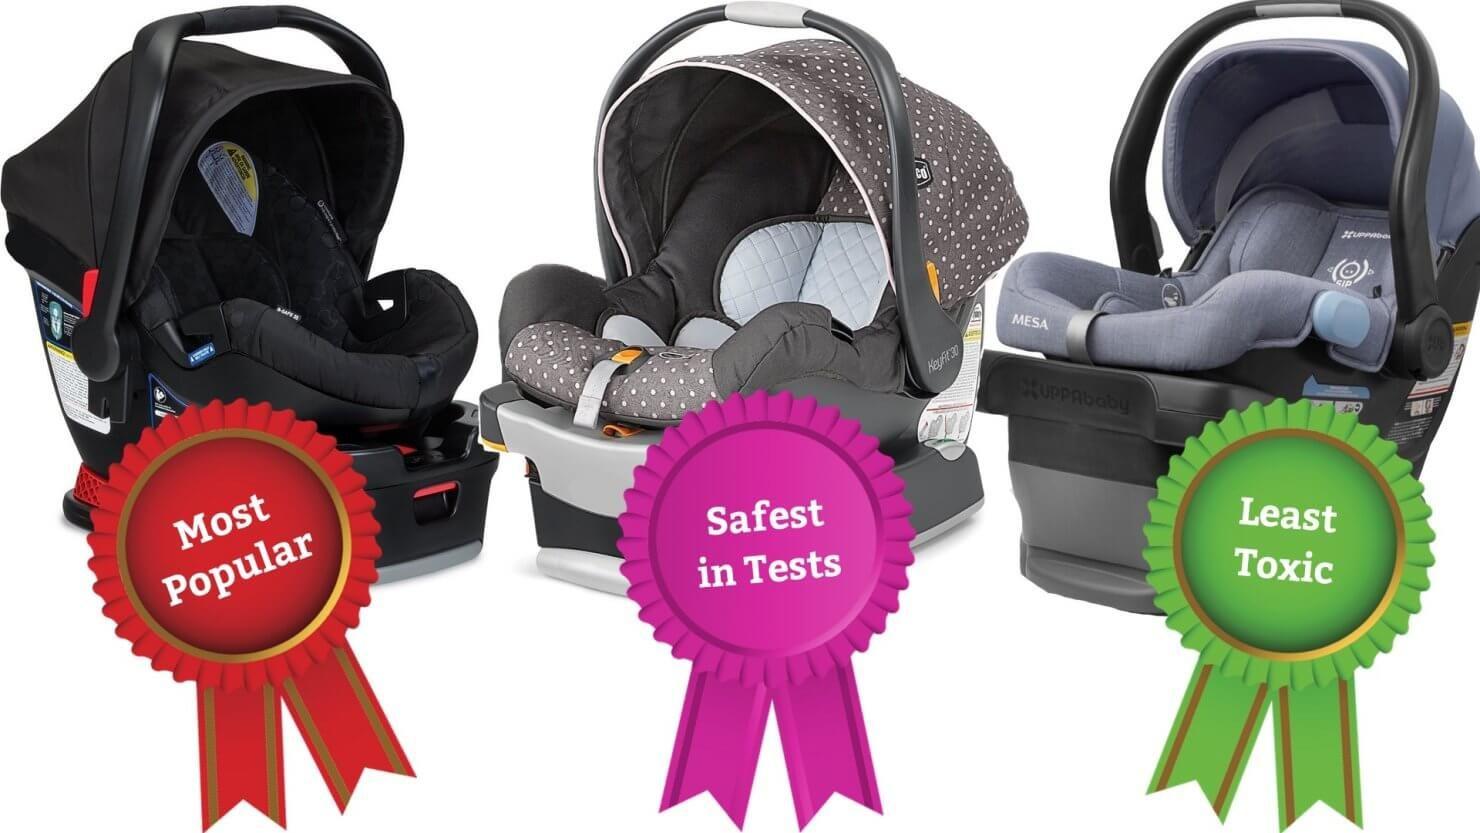 Best Infant Car Seat Safest, Most Natural Options Baby